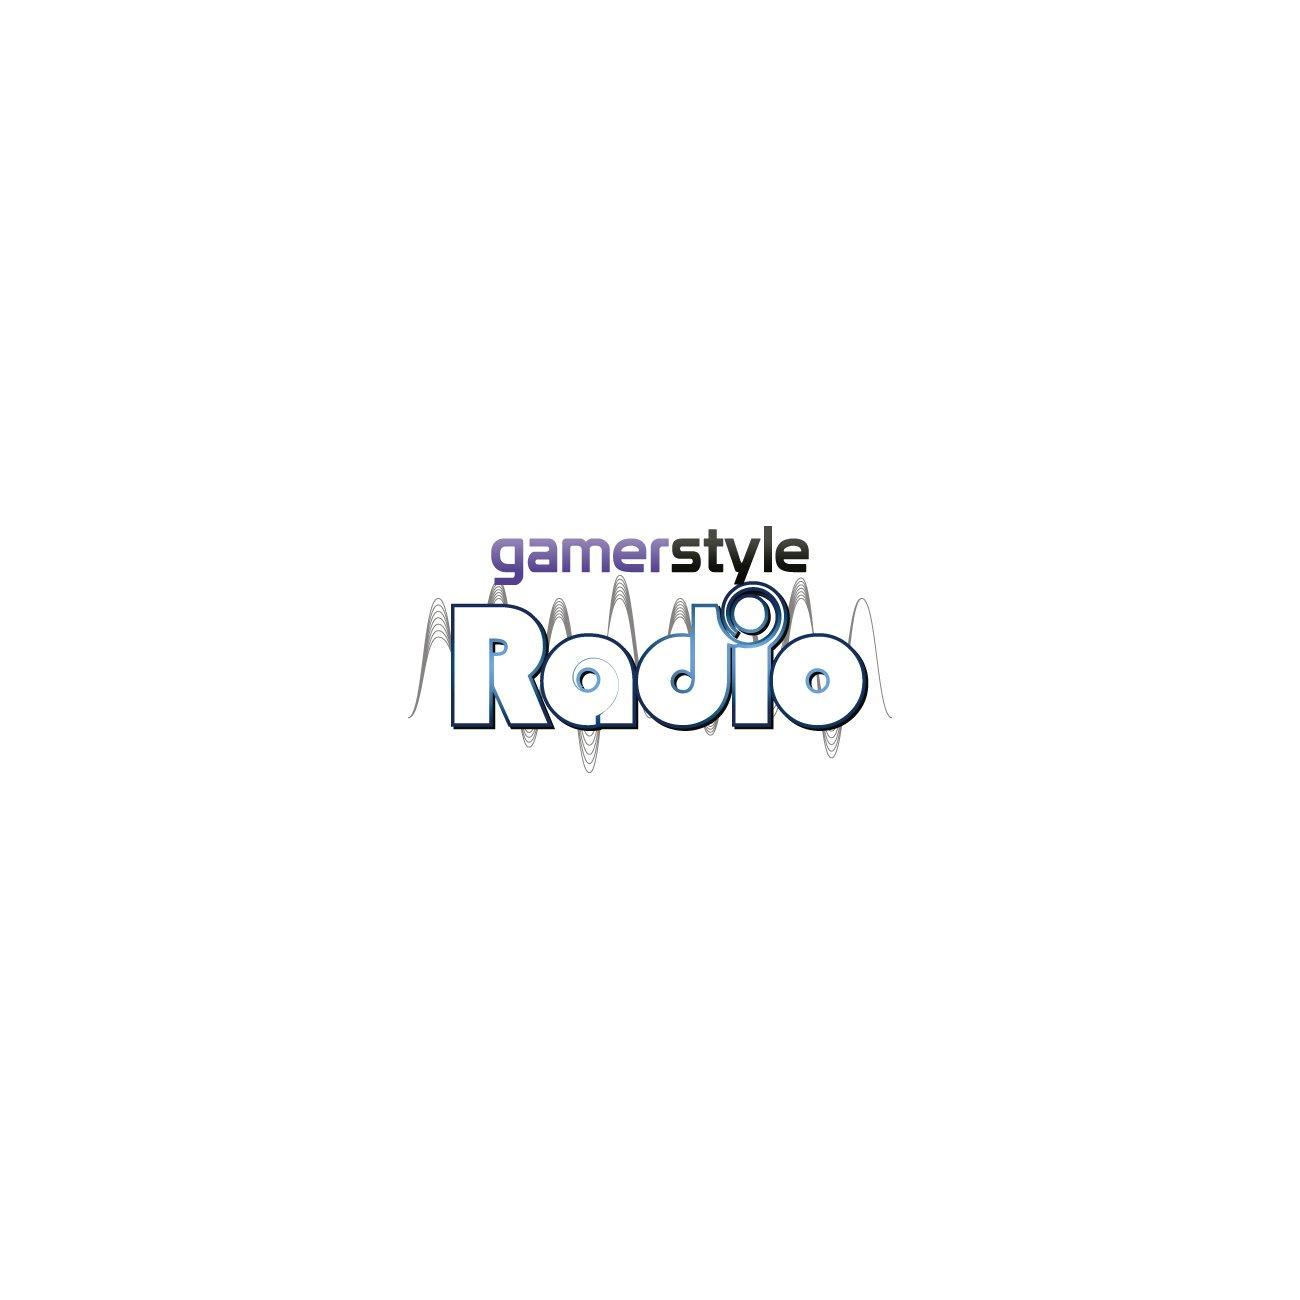 <![CDATA[Gamer Style Radio]]>